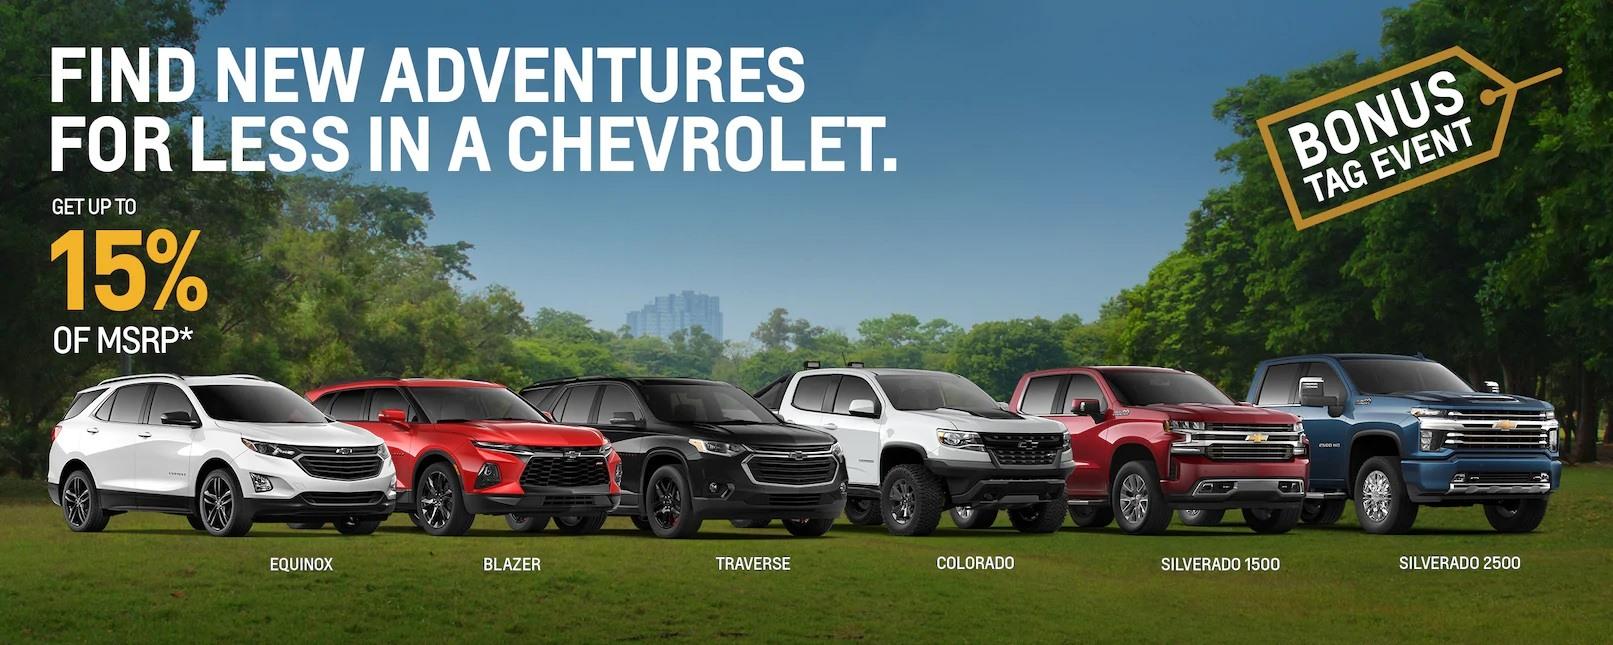 Bonus Tag Event on Chevrolet Vehicles